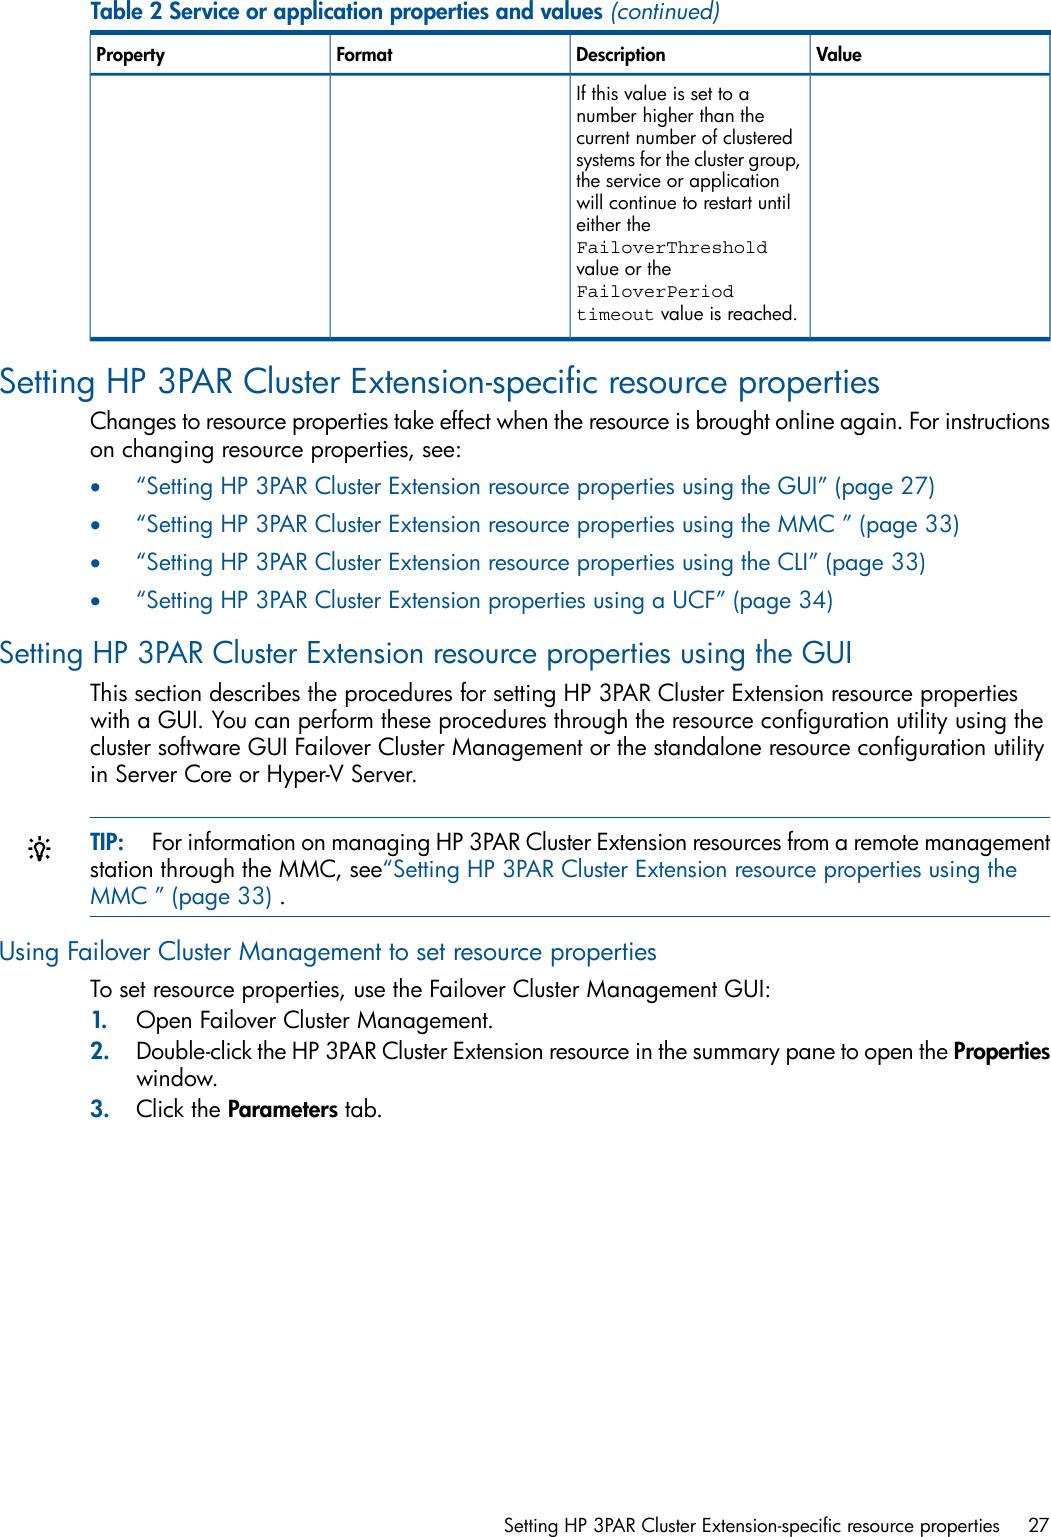 Hp Cluster Software Administrators Guide 3PAR Extension